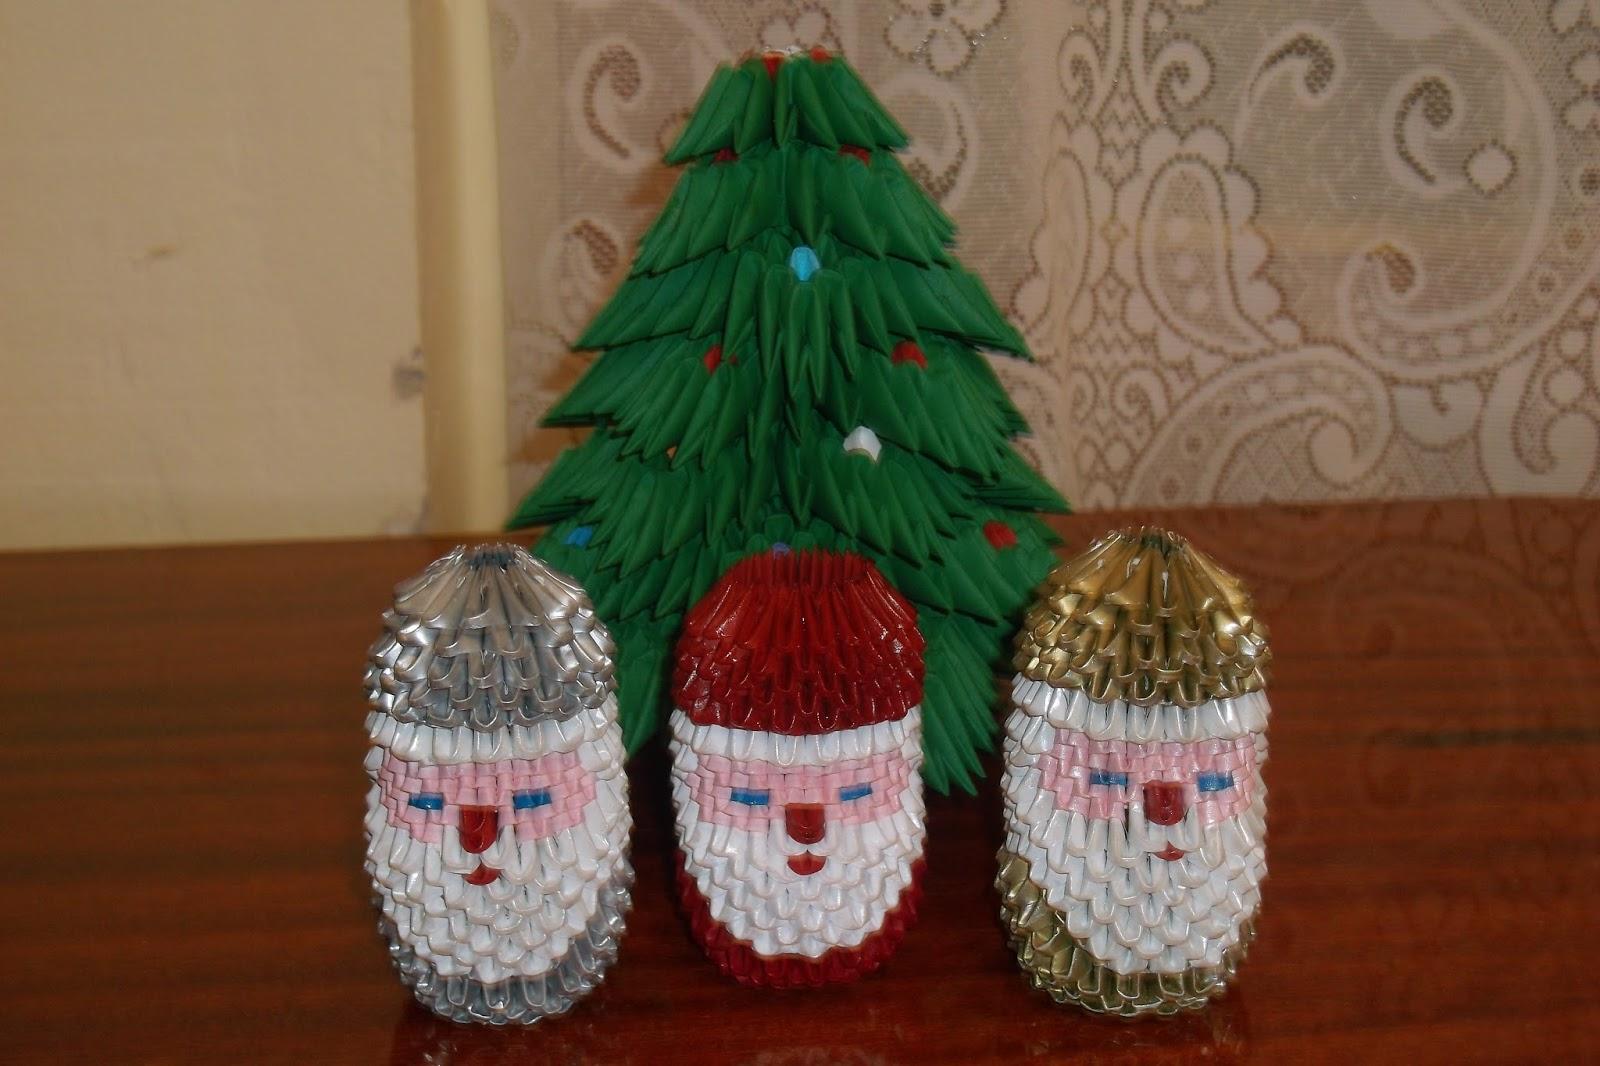 Razcapapercraft august 2015 3d origami christmas tree and small santa claus jeuxipadfo Choice Image